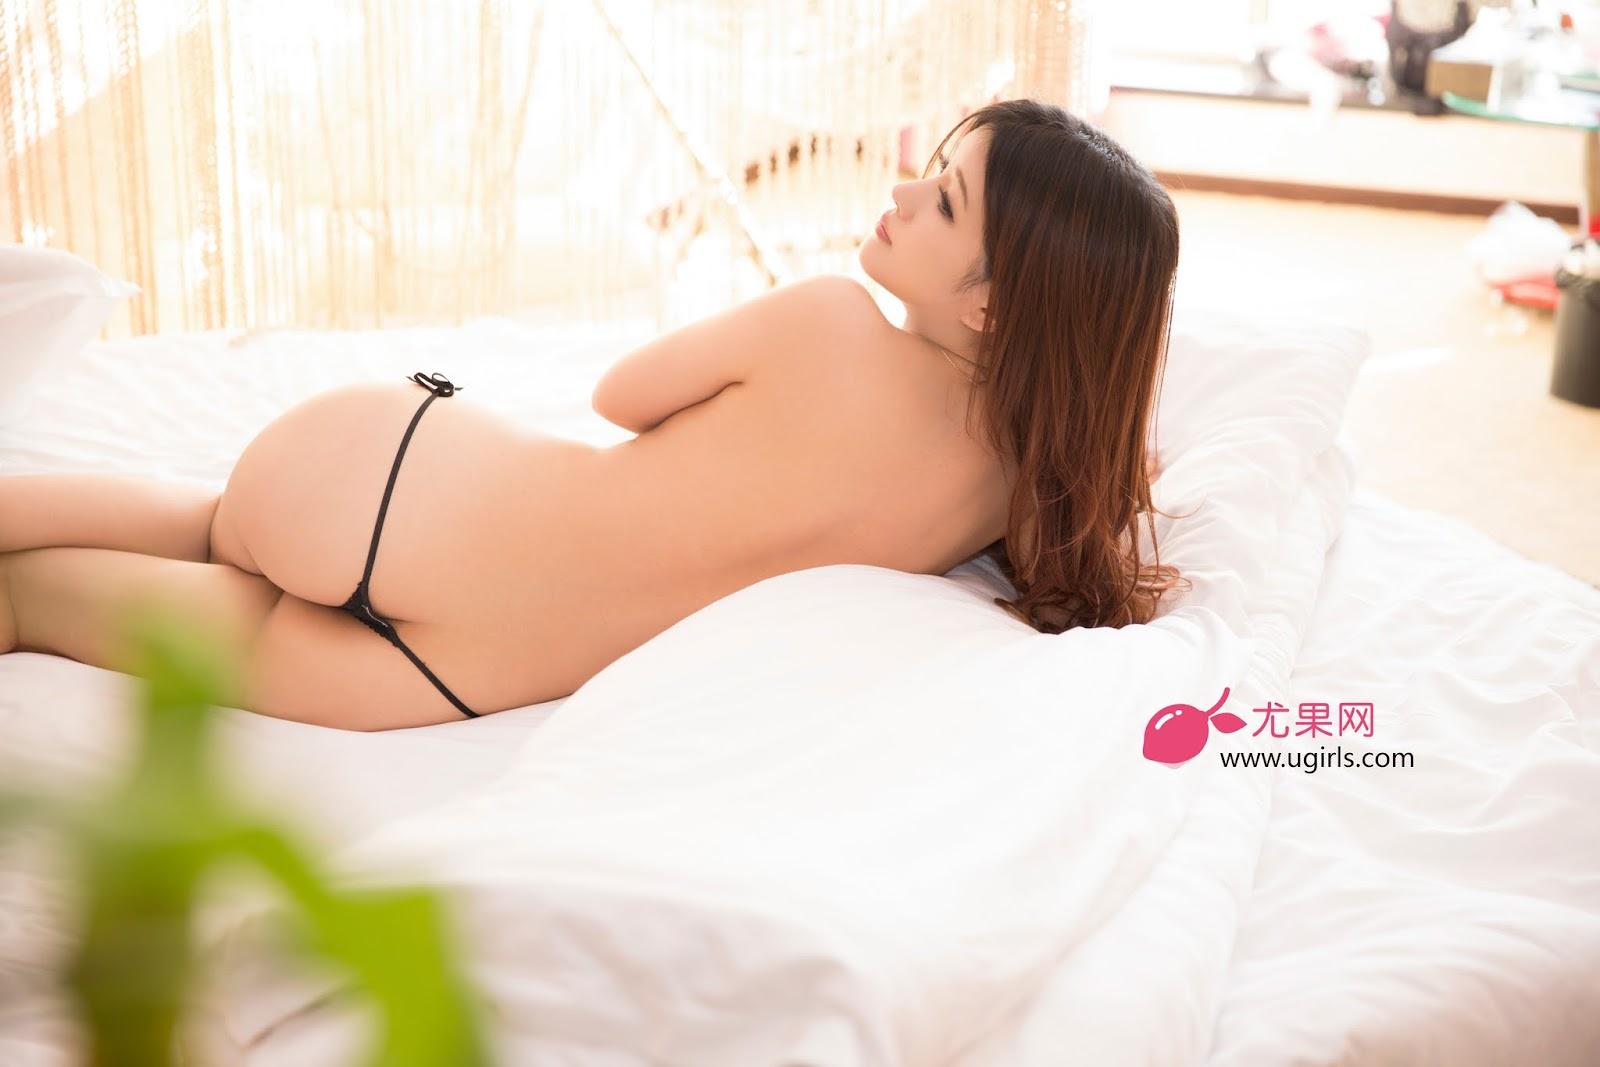 A14A6243 - Hot Photo UGIRLS NO.5 Nude Girl